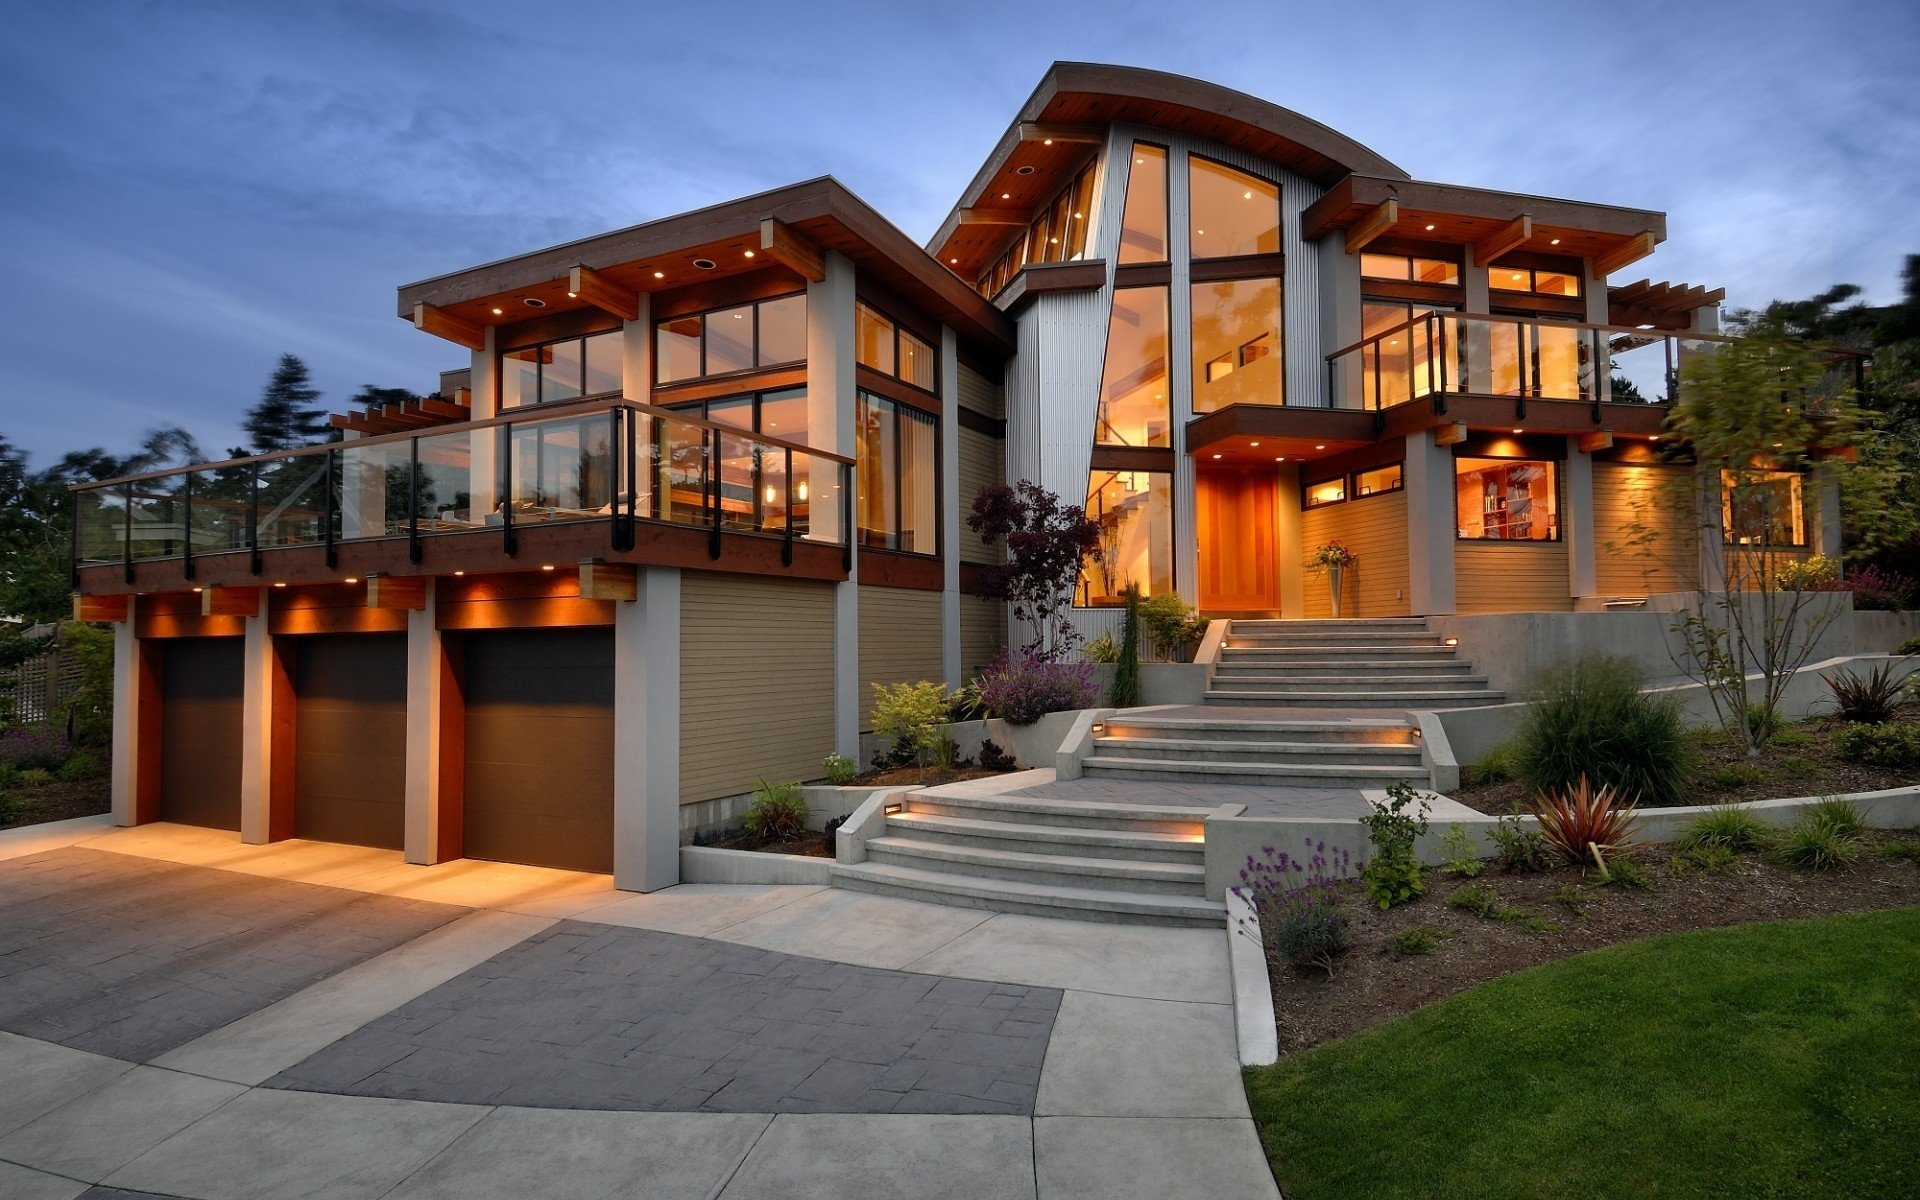 Modern Luxury House Desktop HD Wallpaper 62362 1920x1200px 1920x1200